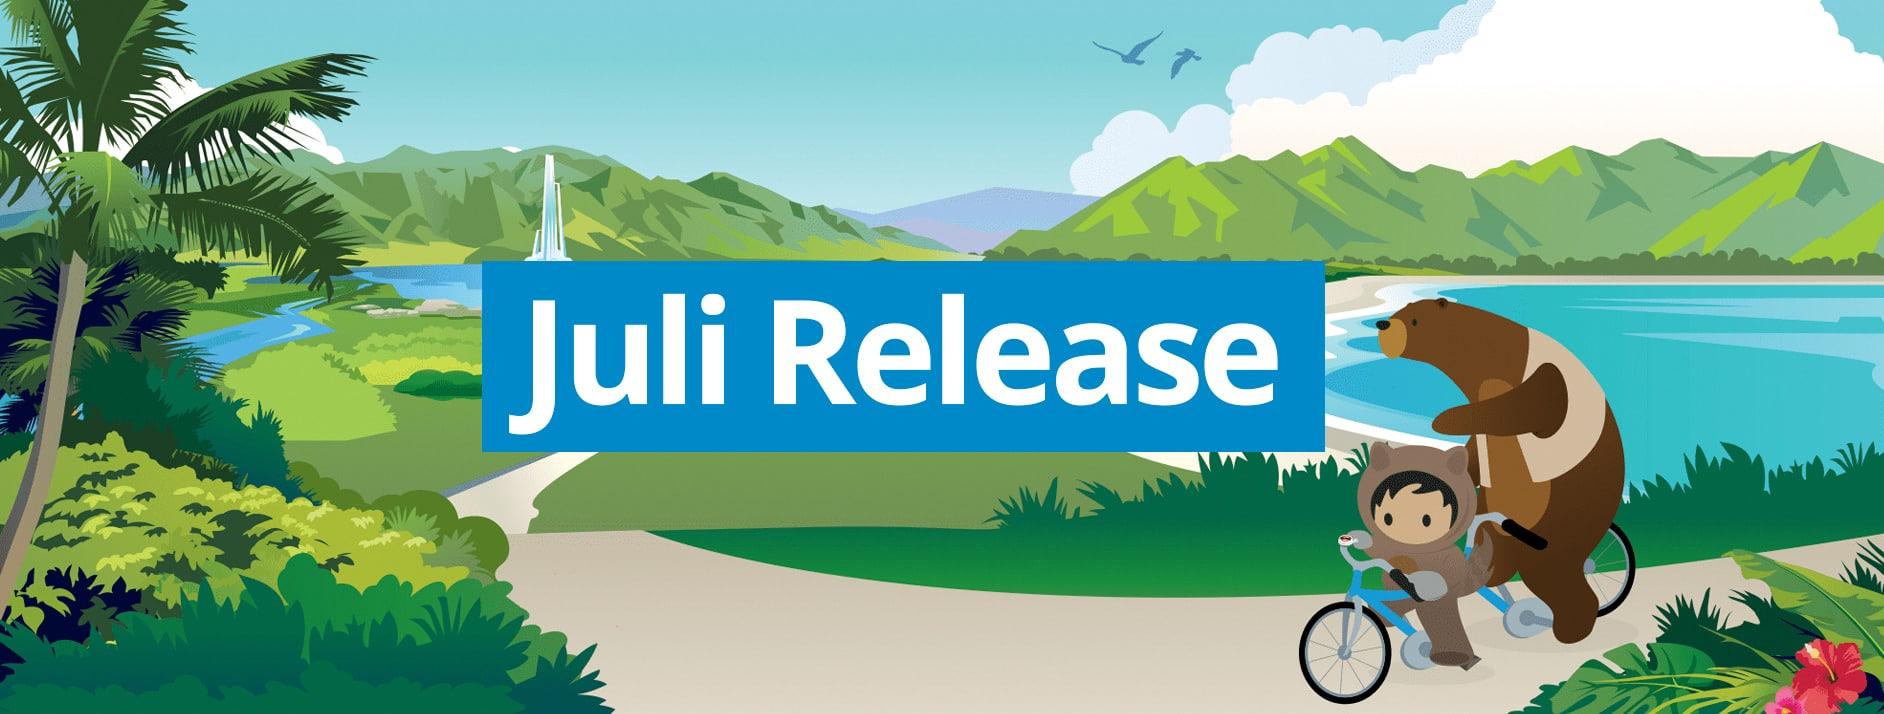 Release Nétive VMS juli 2020